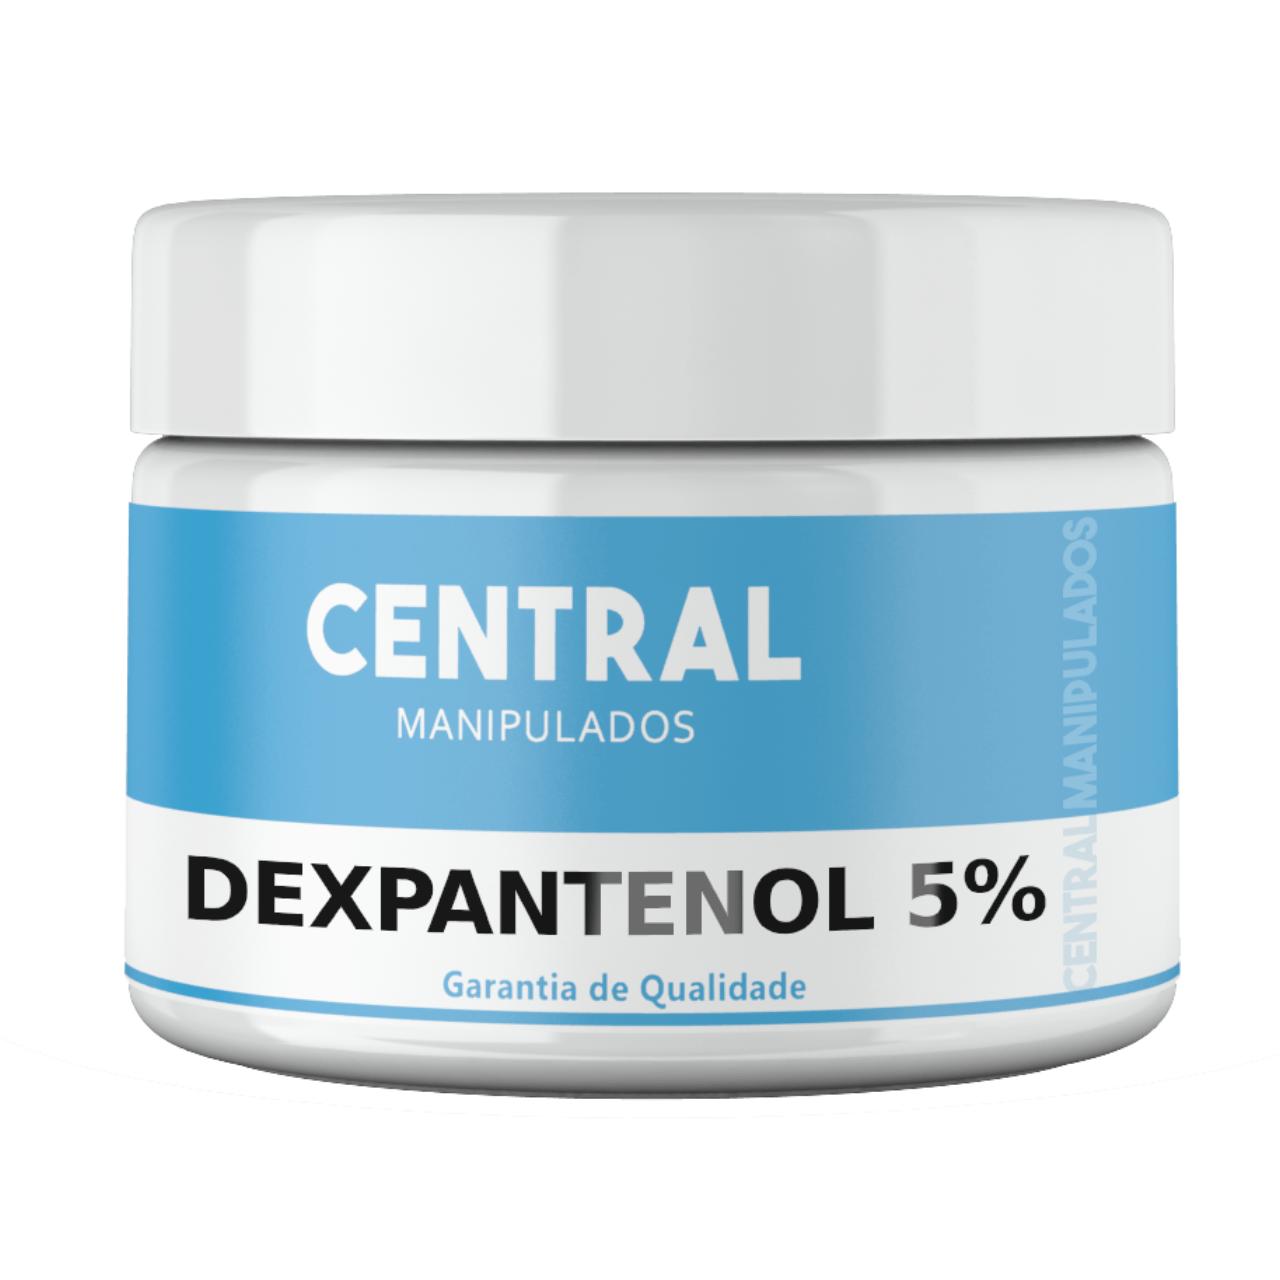 Dexpantenol 5% Creme 100g - Hidratante e Antioxidante, Reduz manchas